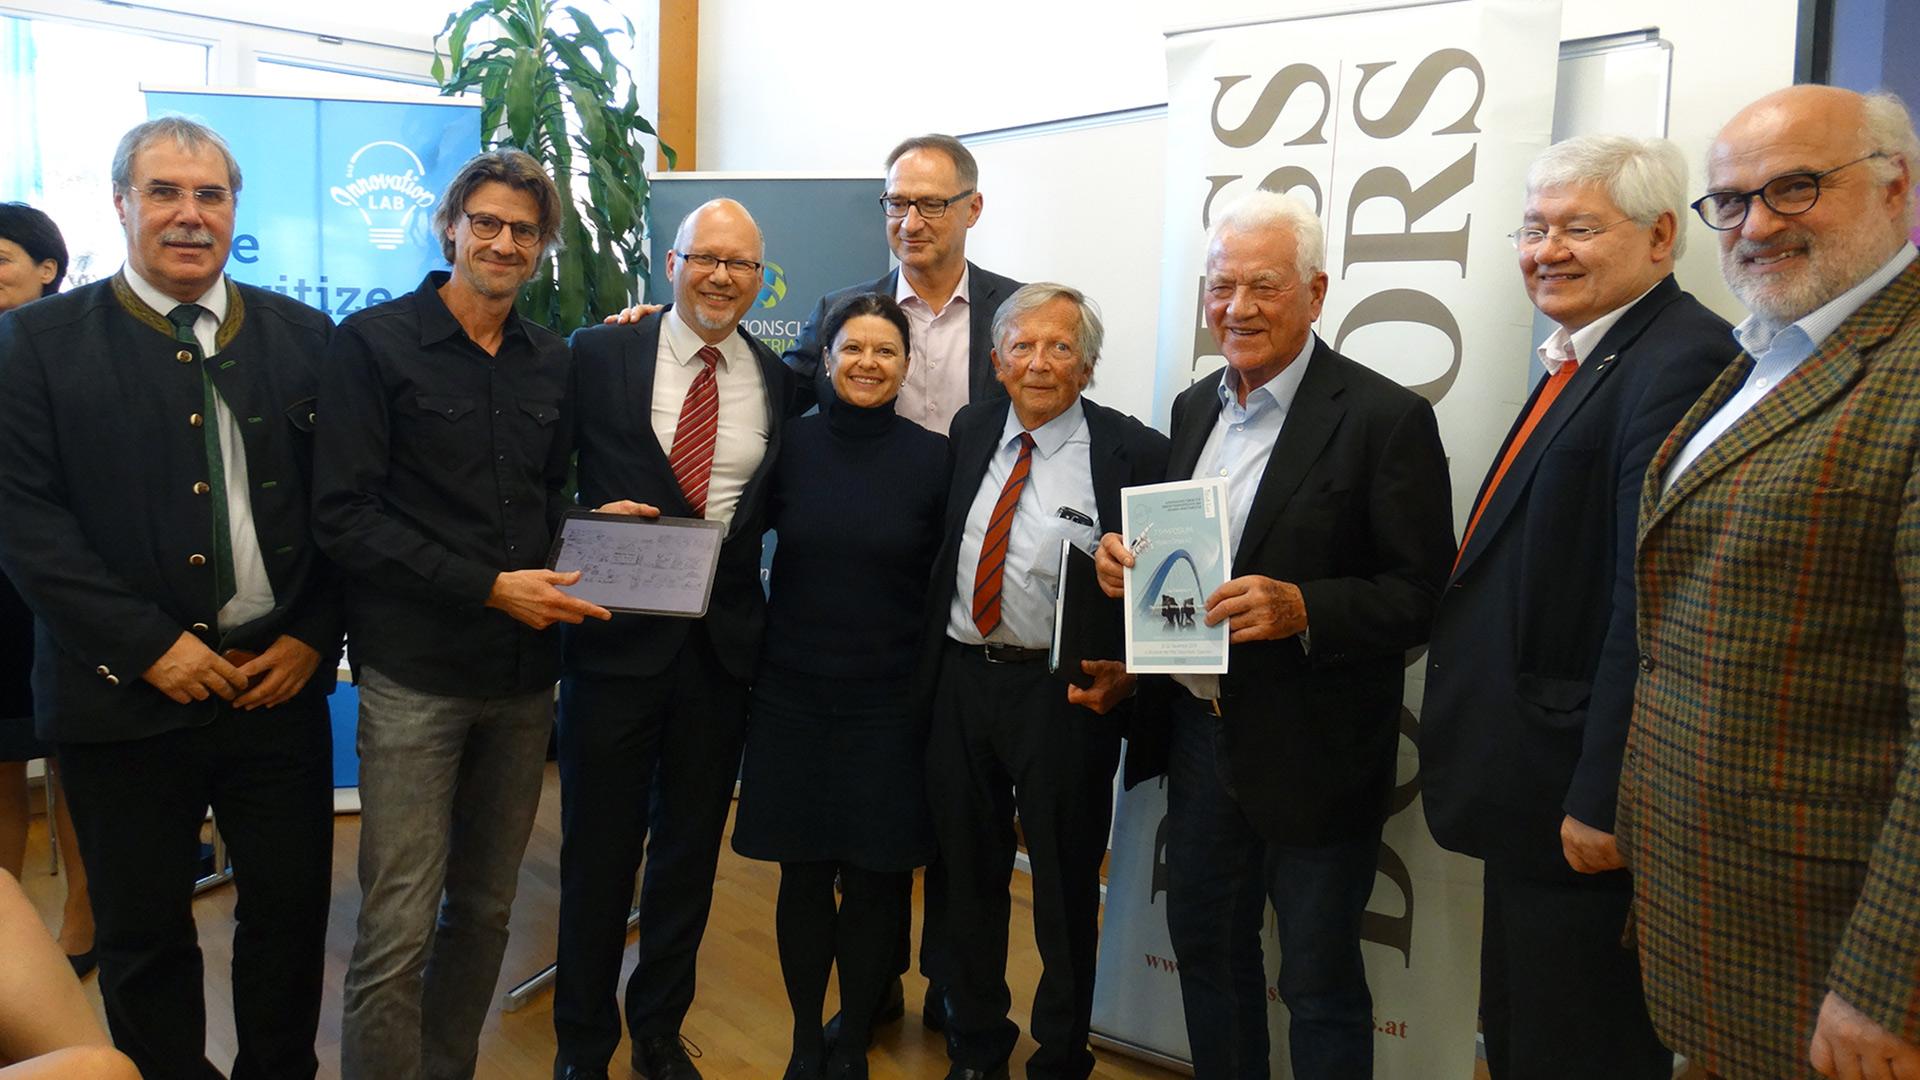 v.l.n.r. DI Anton Aldrian, Ing. Reinhard Gussmagg (Gussmagg Art), Michael Kornhäusel (Business Doctors), Mag. Bernd Bruckmann (Qiquadrat), Mag.rer.soc.oec.Dr.phil. Manuela Hargassner-Delpos, Bmask, F.K. Daublebsky (Business Doctors), Frank Stronach, Dr. Wolfgang Schinagl (WKO), Dr. Viktor Weinrauch, Egomanum